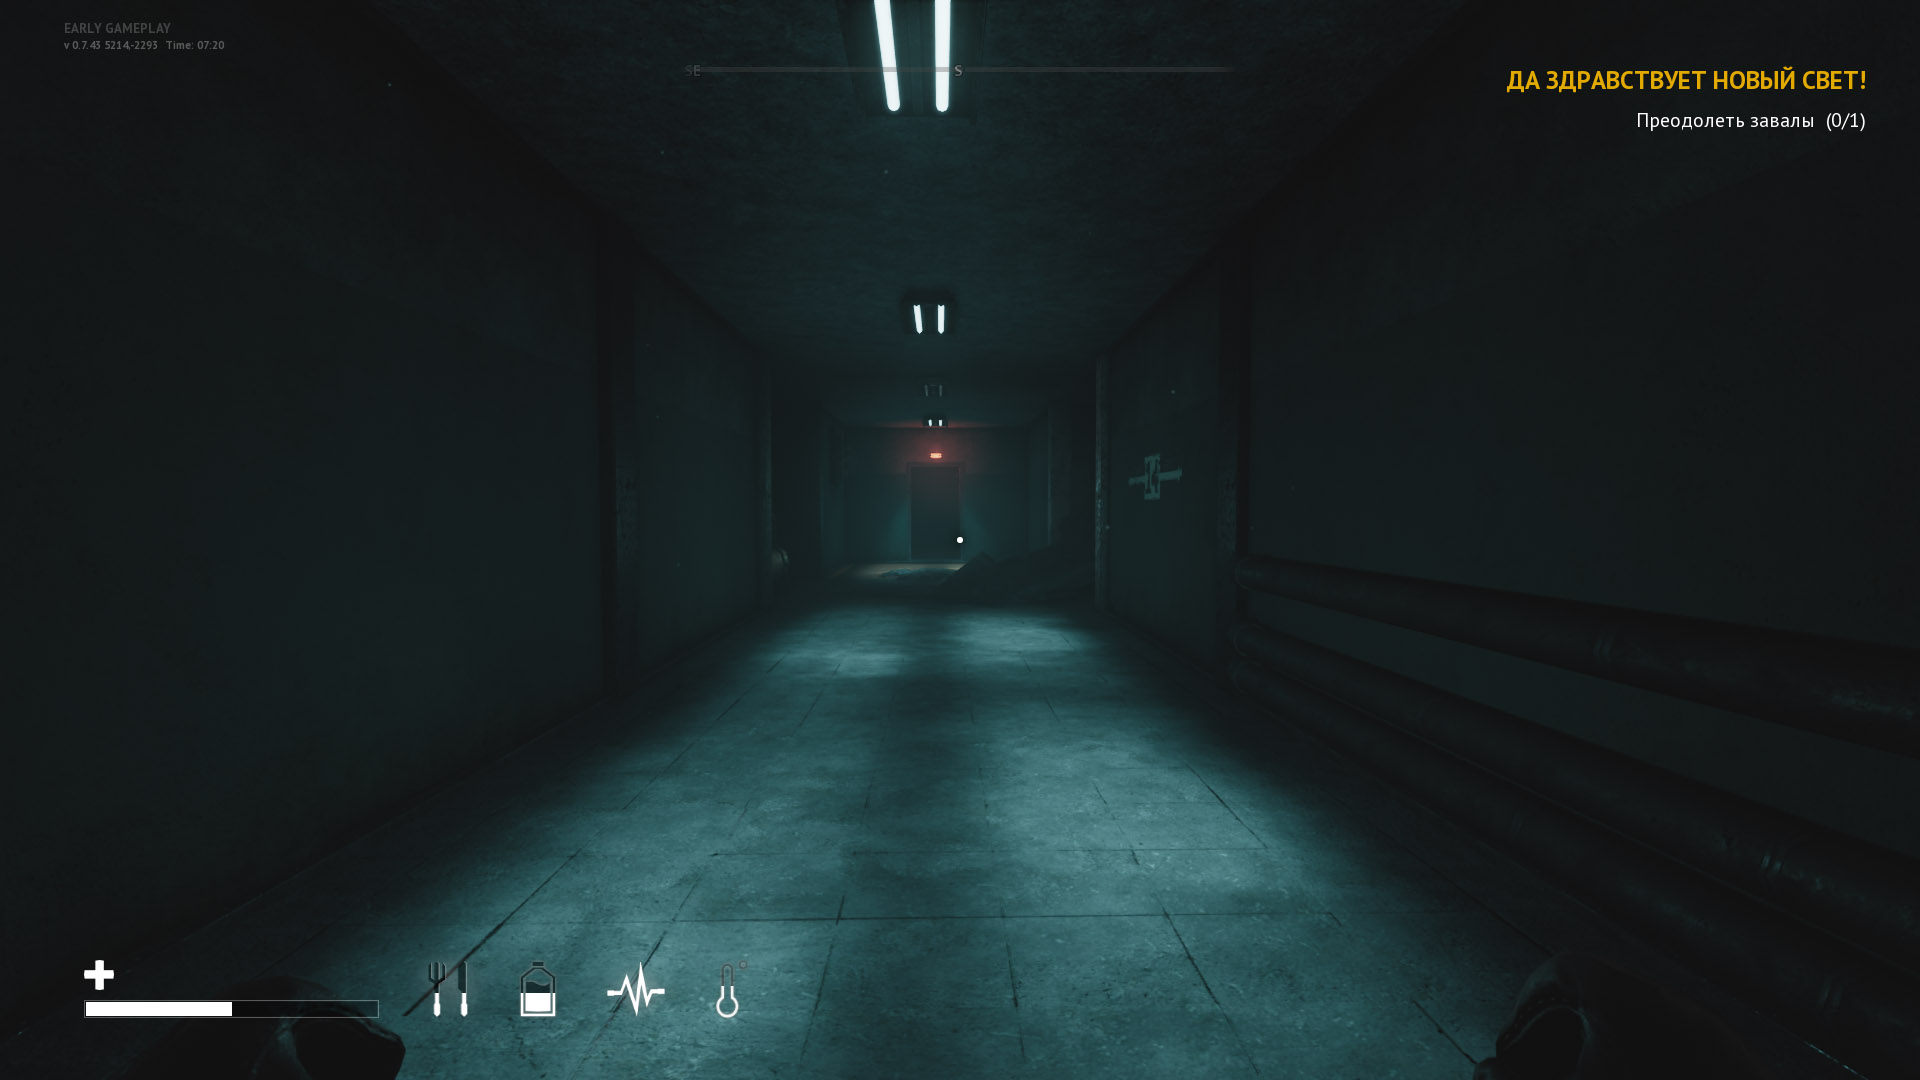 Скриншоты к Desolate v0.8.1.4 на русском языке (Onine/Singleplayer) | Репак от xatab